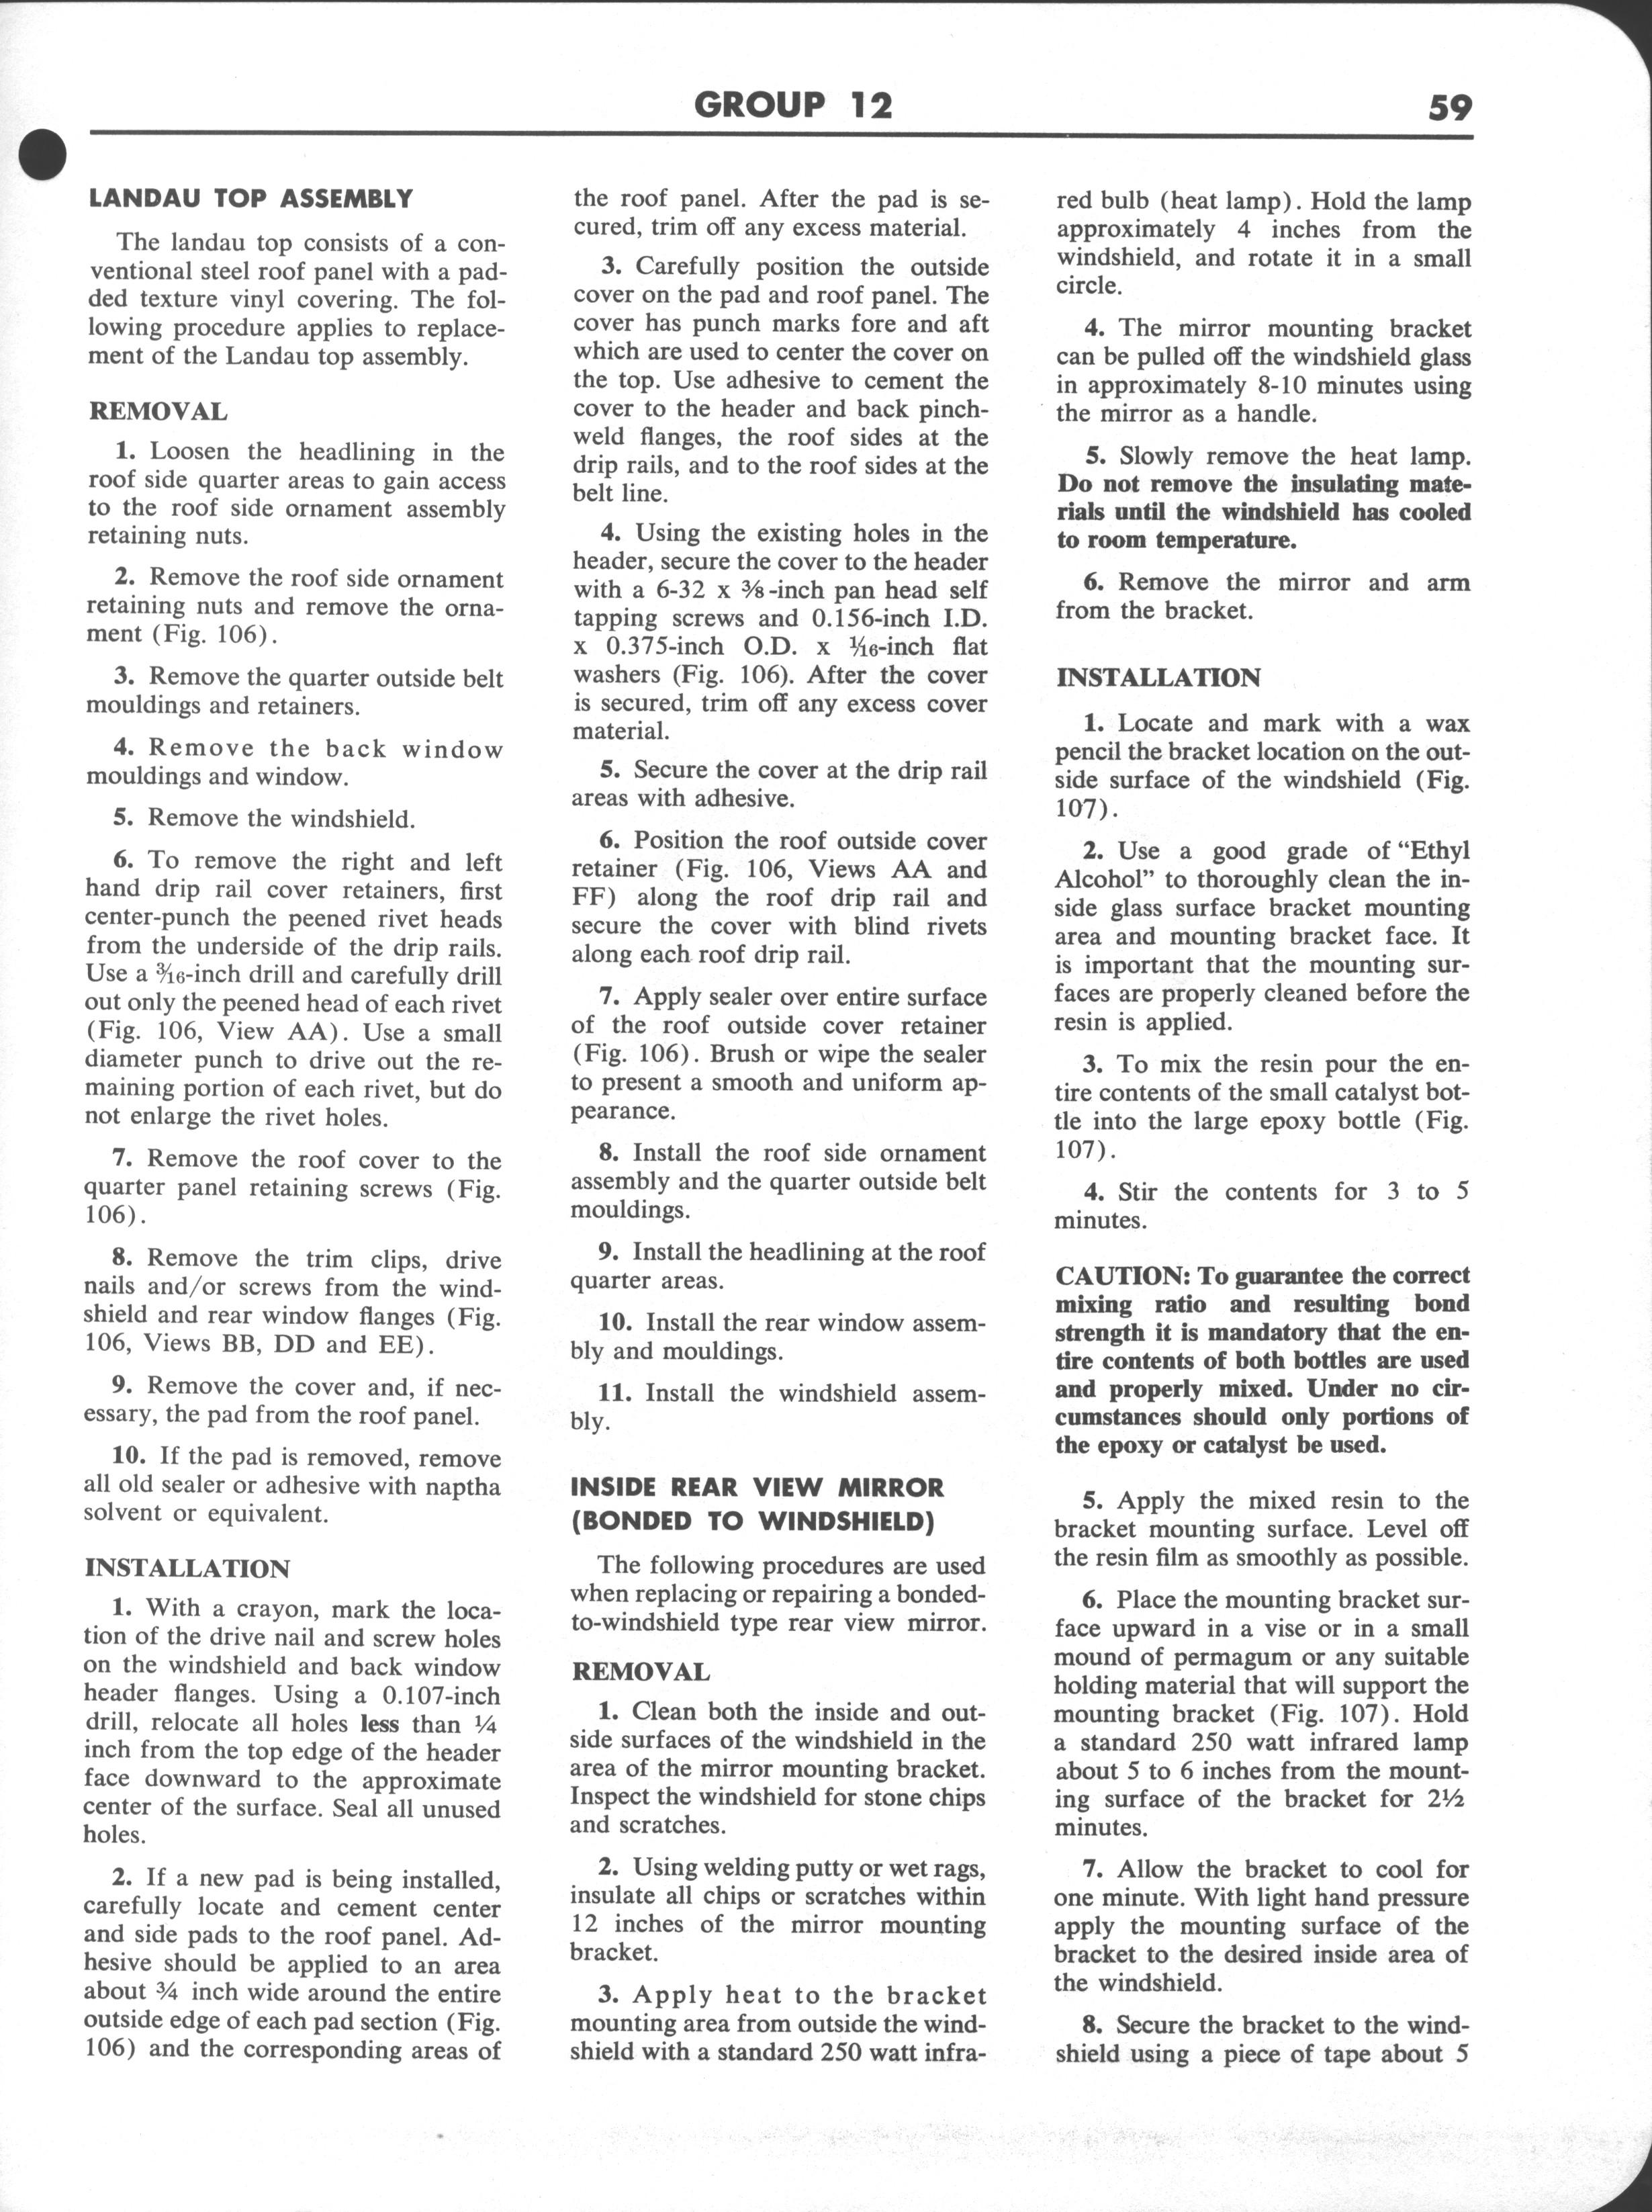 Falcon Shop Manual Supplement, 1963: Page 59